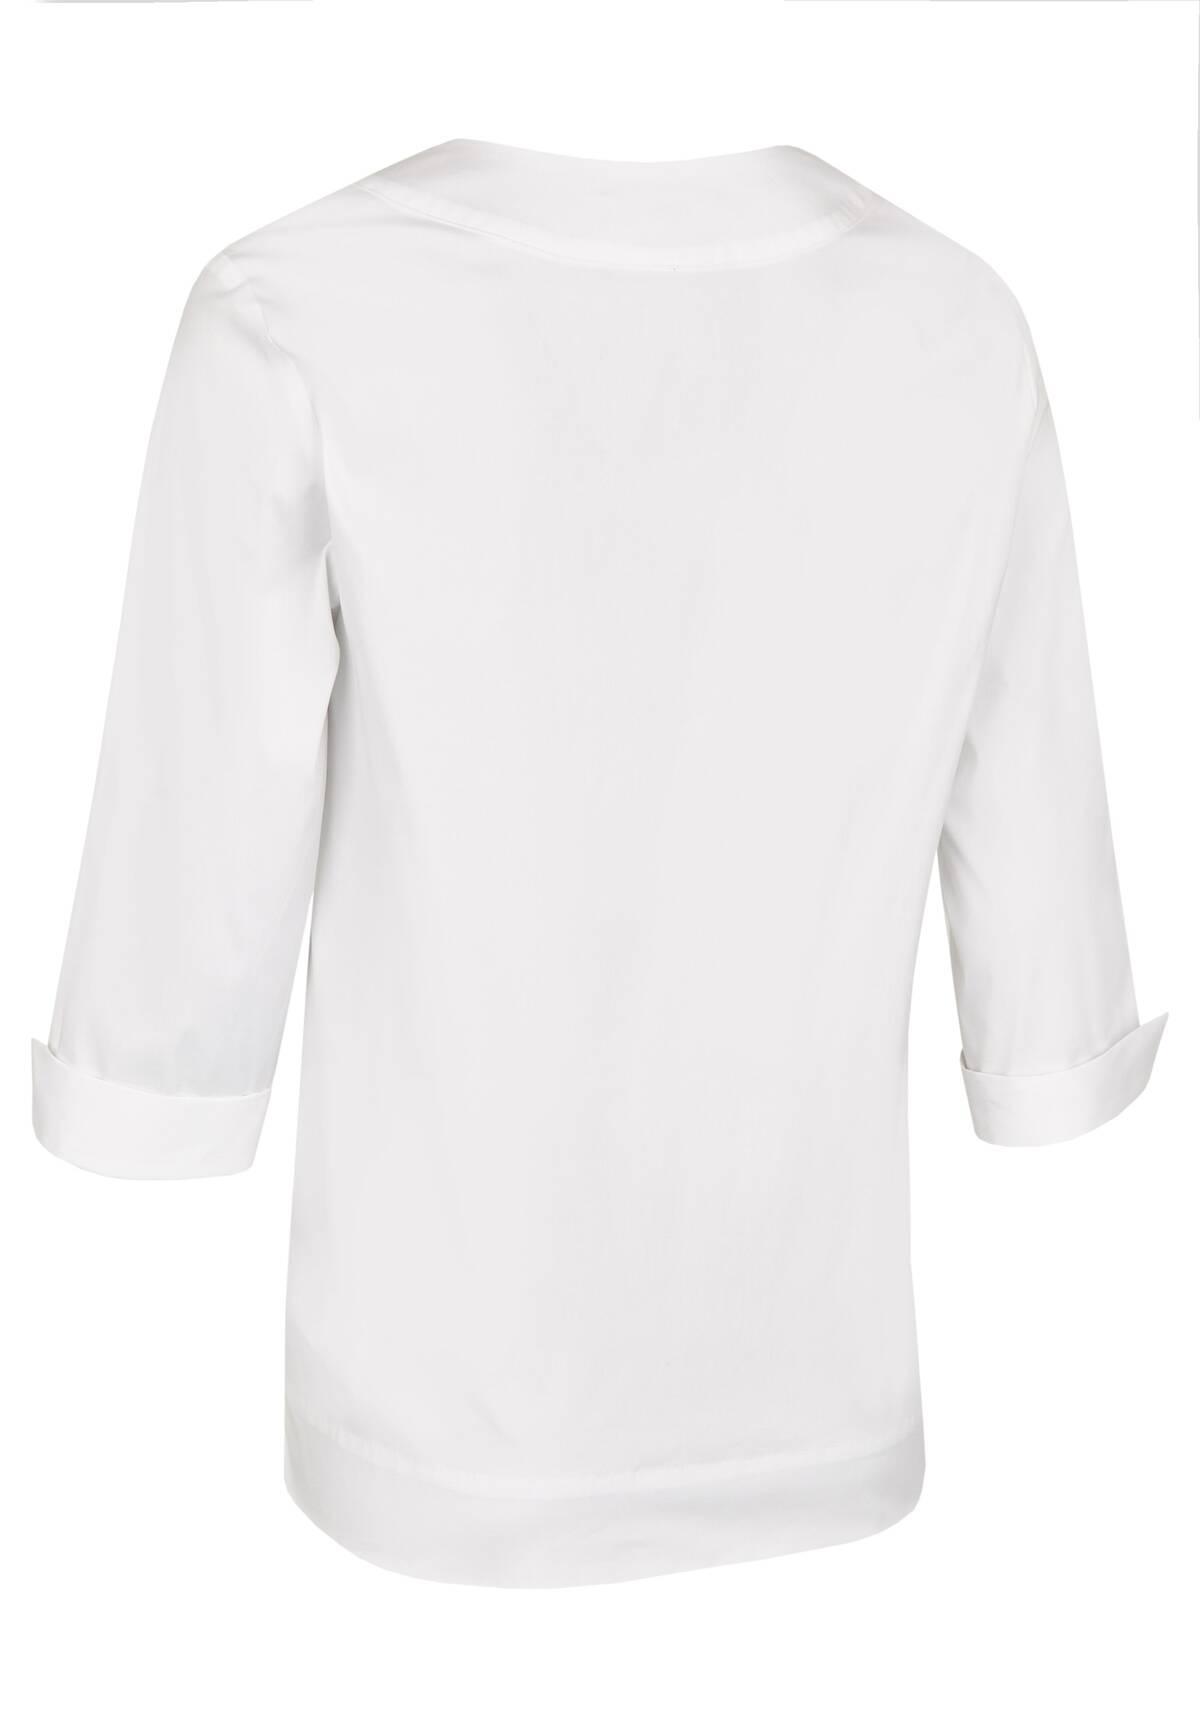 Klassische Tunika-Bluse / Tunika Blouse